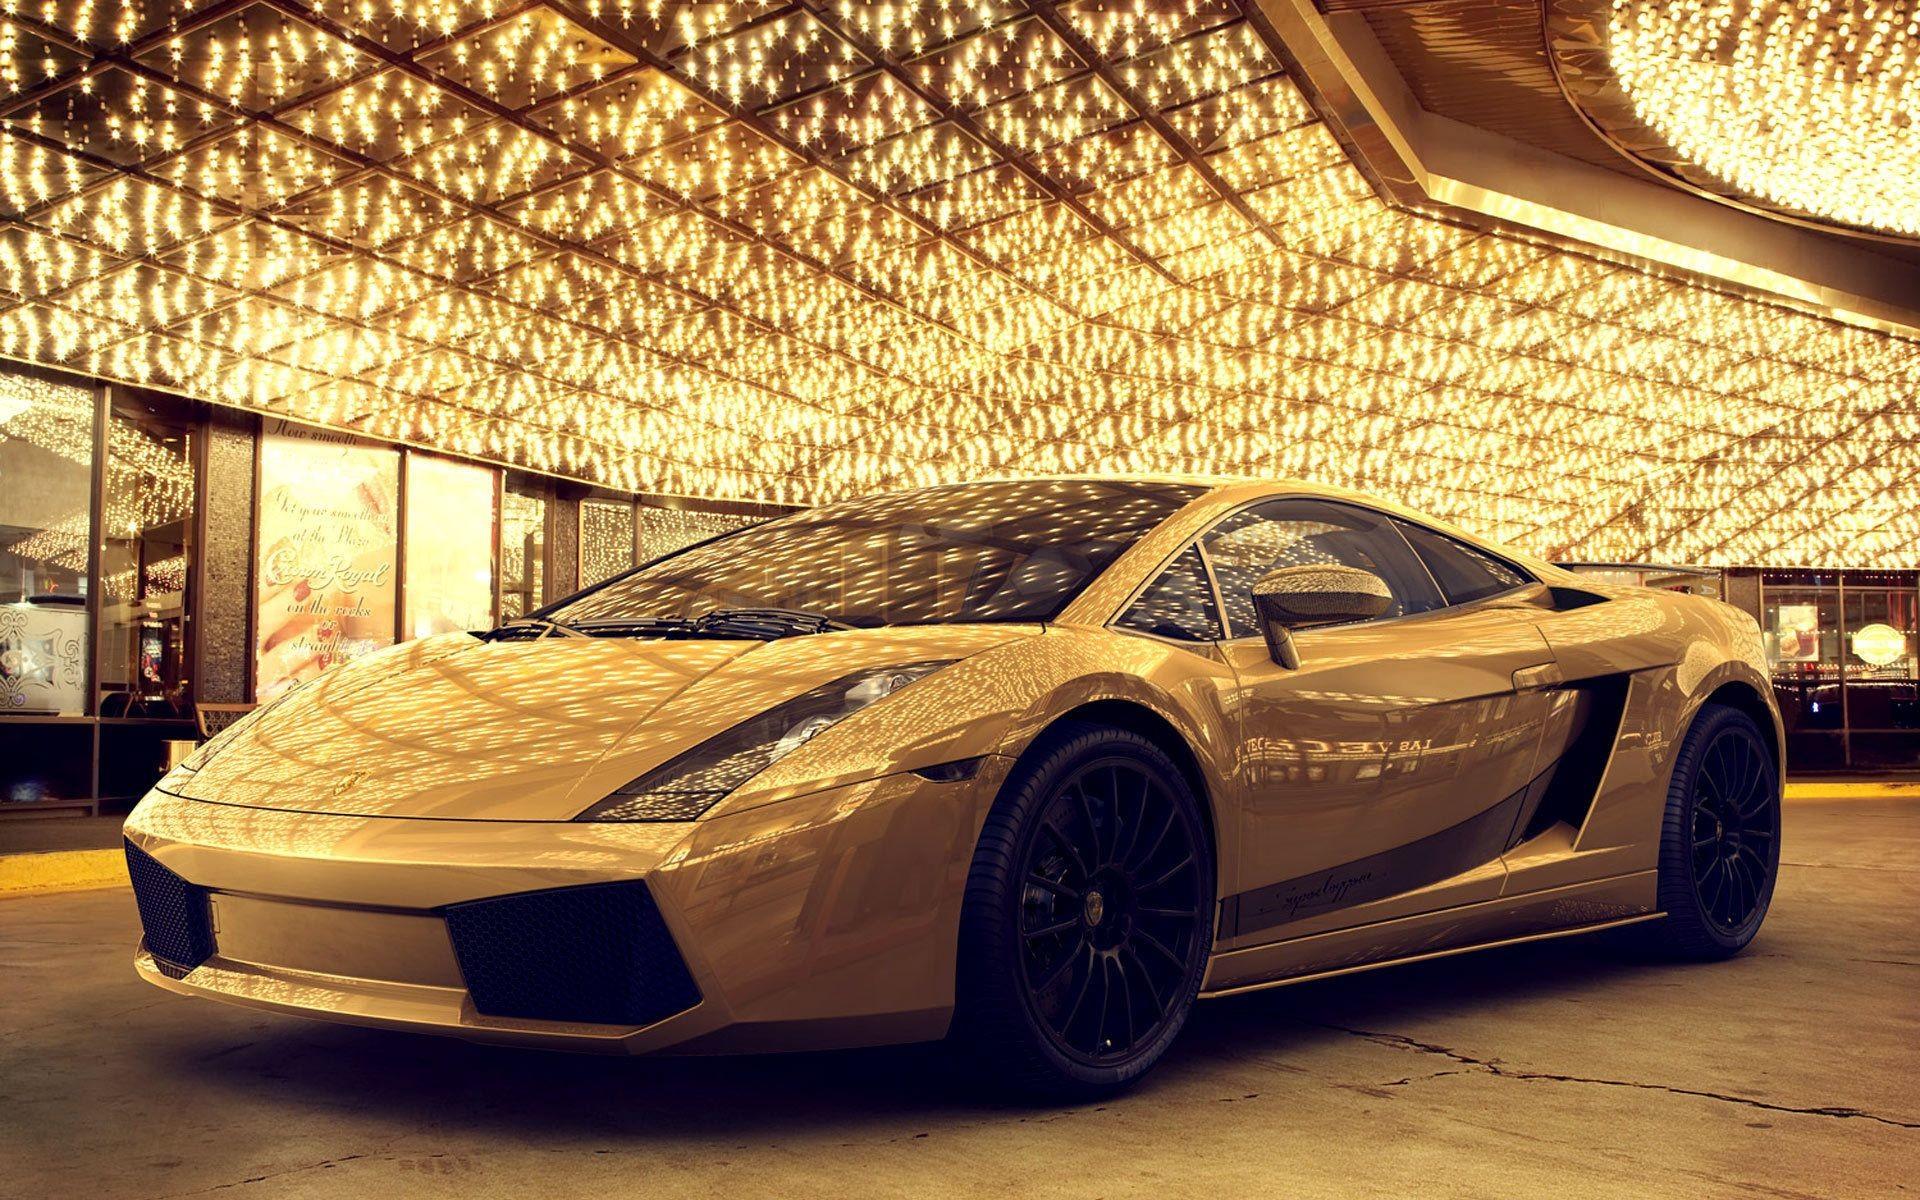 1920x1200 Beautiful HD Wallpapers Very AttractiveTop Wonderful Gold Plated Lamborghini